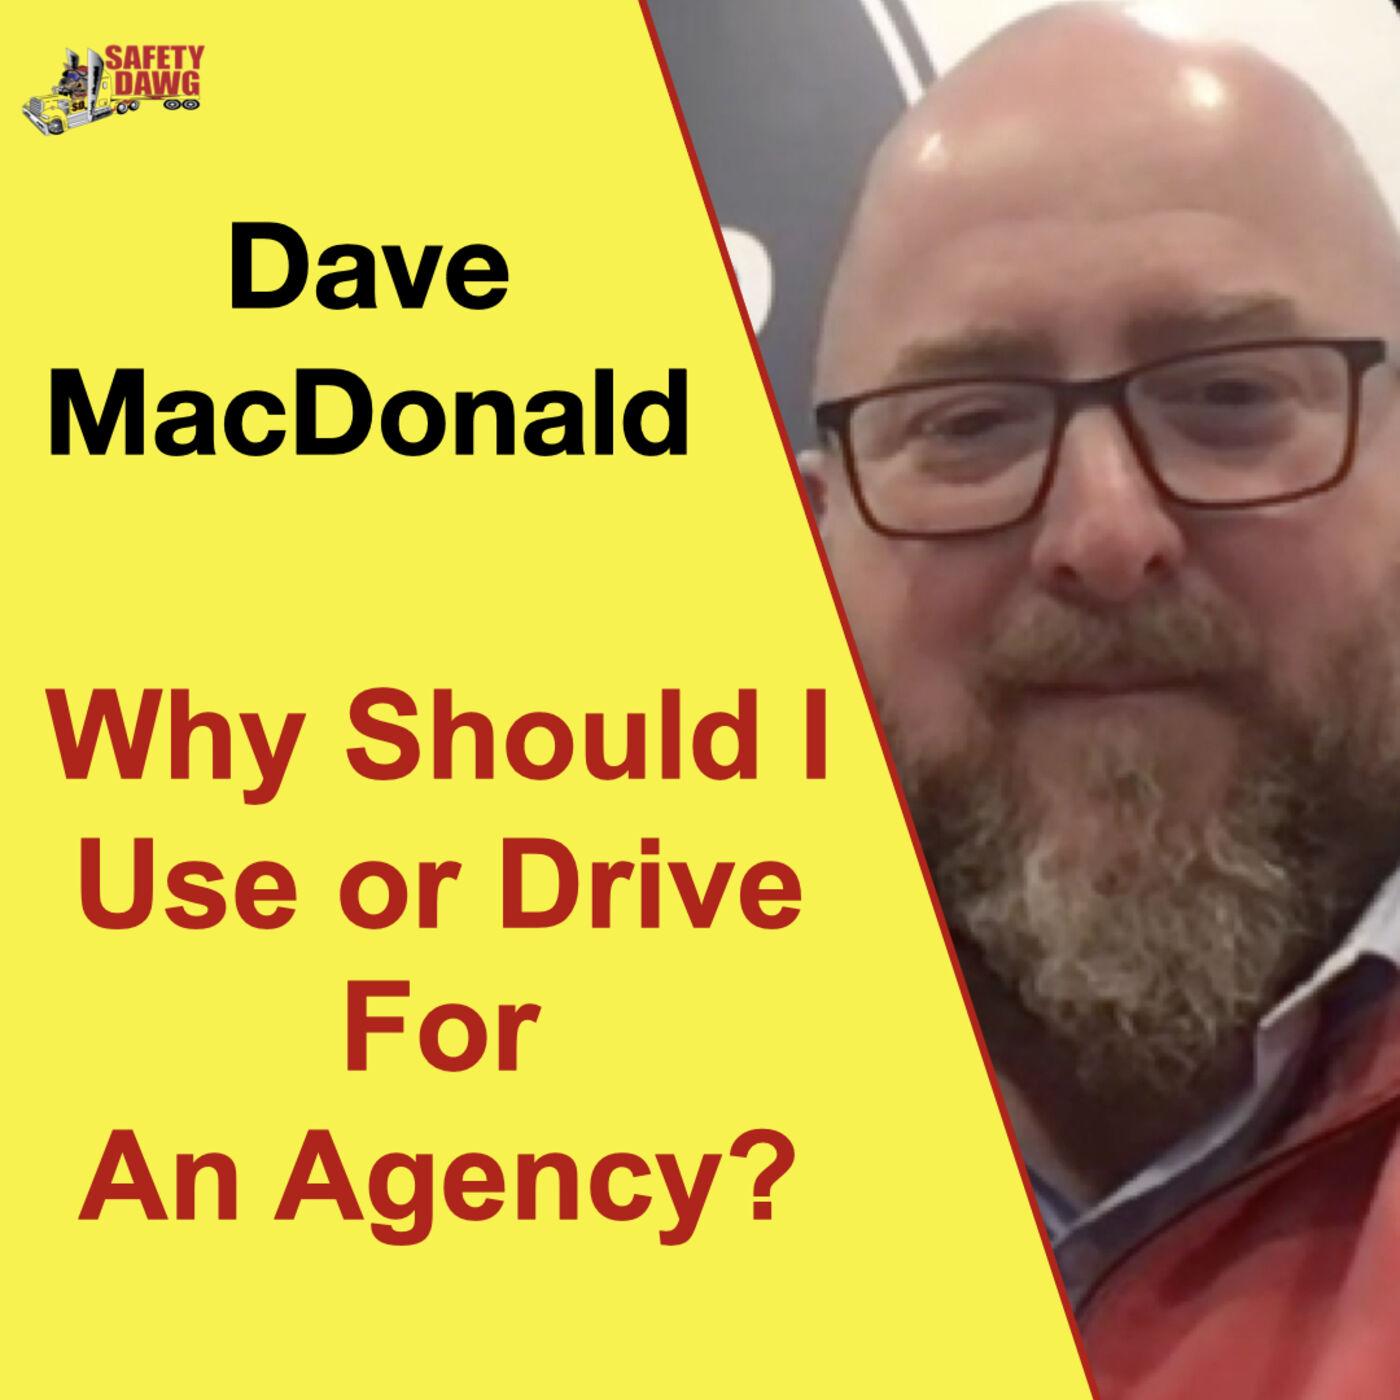 Revolution Staffing's Dave MacDonald